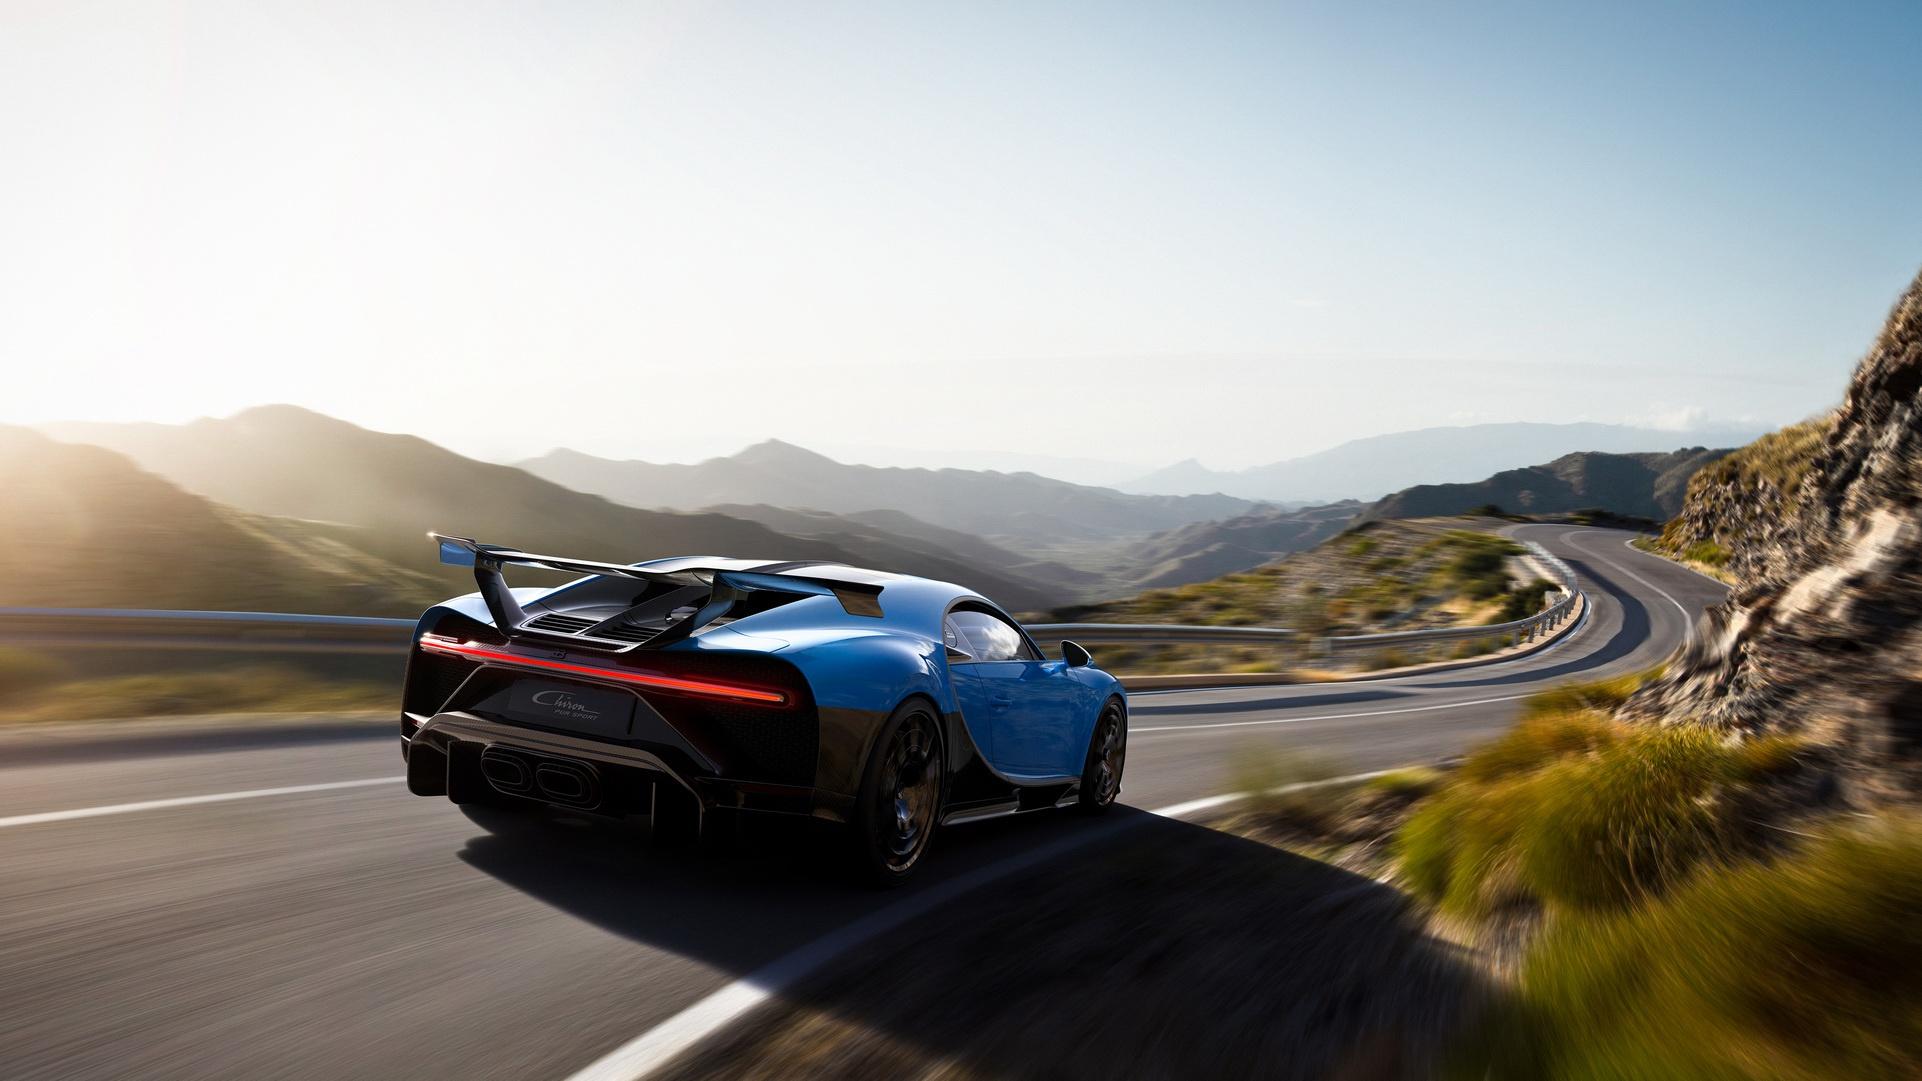 Bugatti Chiron phien ban moi ra mat - sieu xe gia 3,55 trieu USD hinh anh 3 A2.jpg